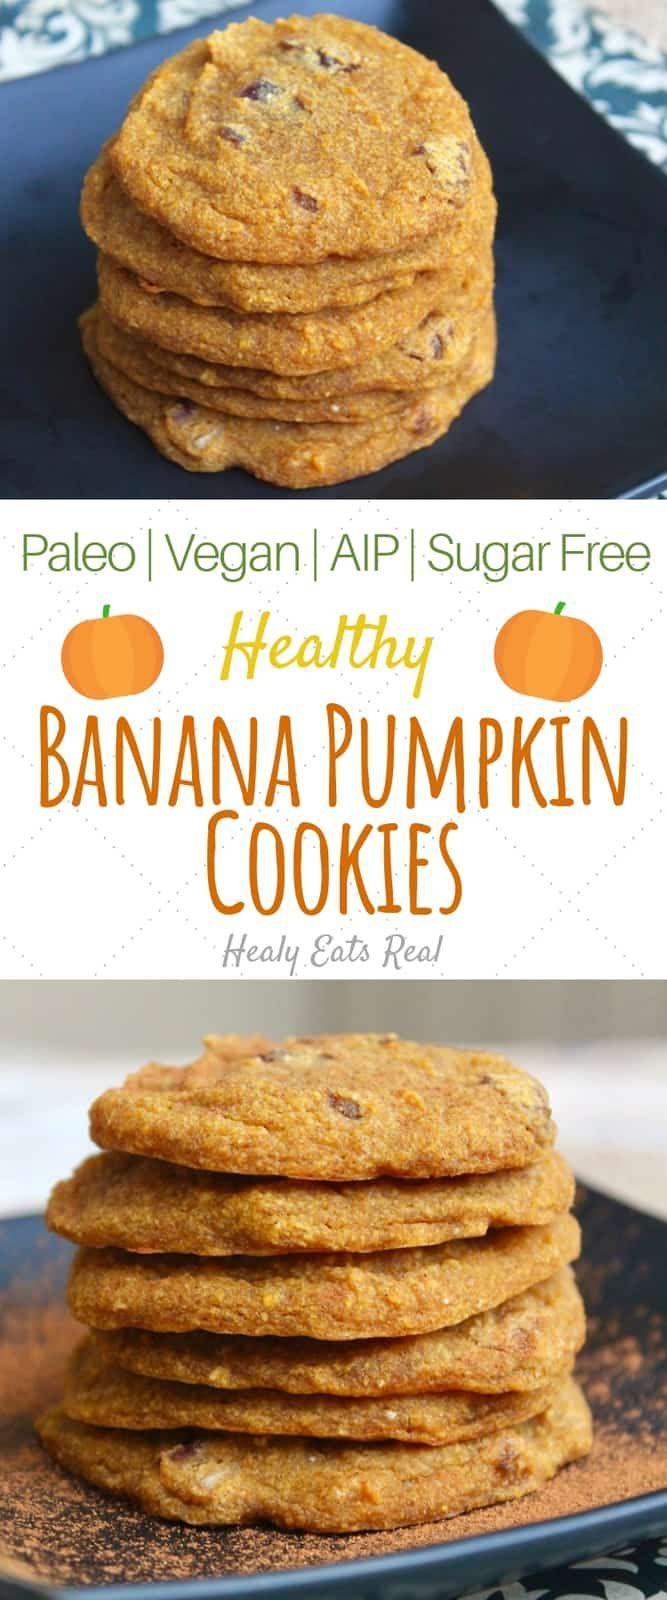 Healthy Banana Pumpkin Cookies (AIP, Paleo, Vegan, Sugar Free)